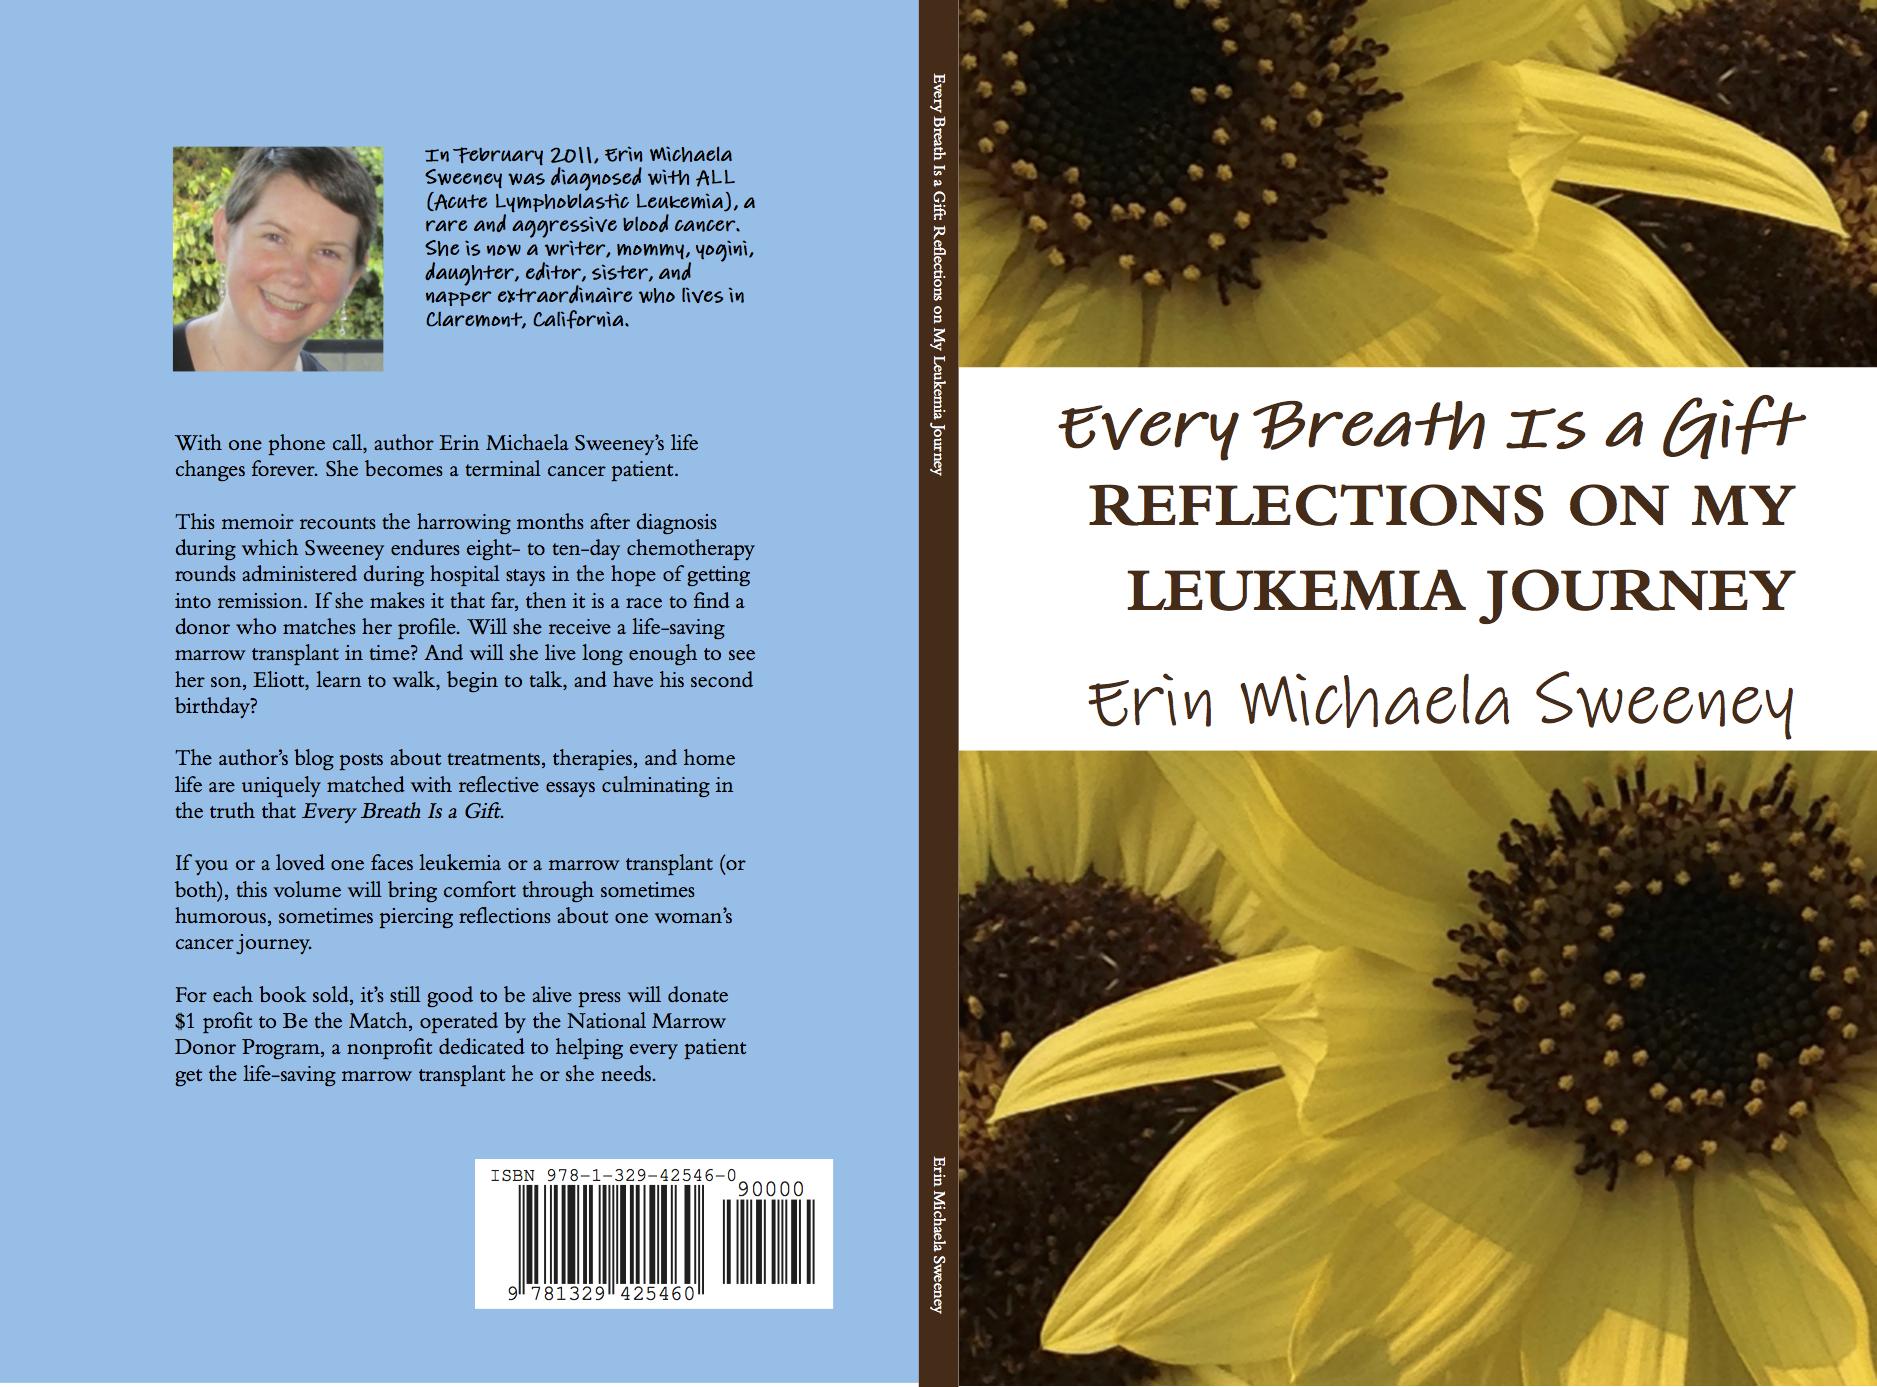 Every Breath Is a Gift: Reflections on My Leukemia Journey Erin Michaela Sweeney